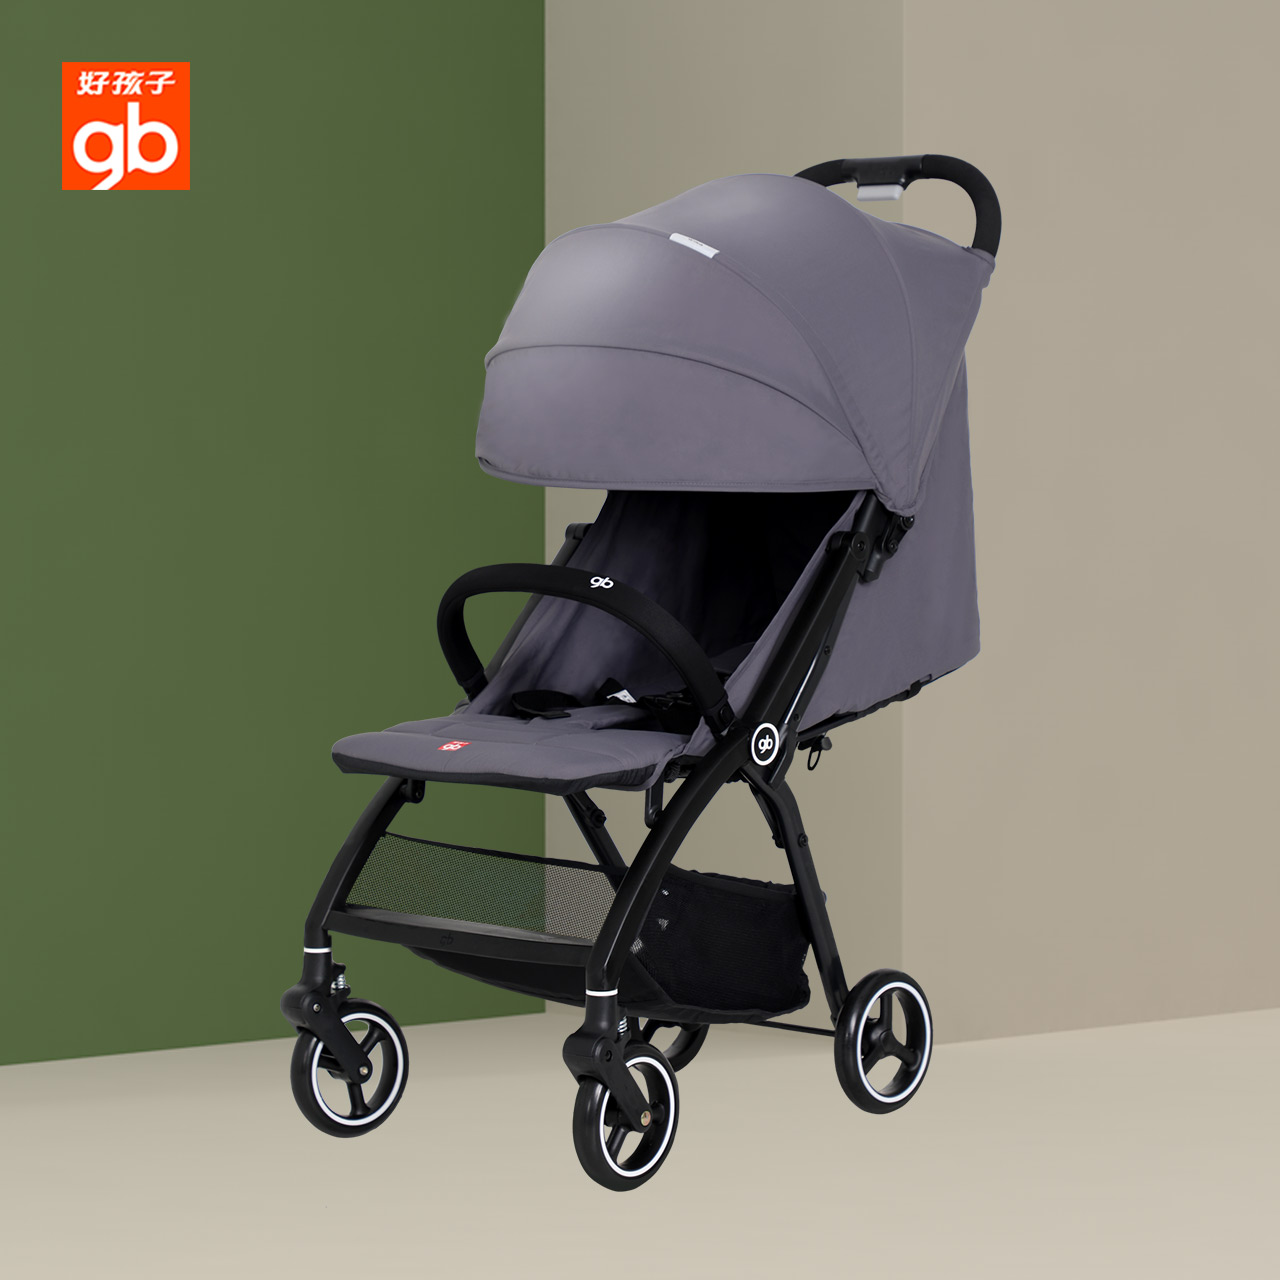 gb好孩子婴儿推车儿童轻便折叠推车车可坐可躺婴儿车可上飞机D643